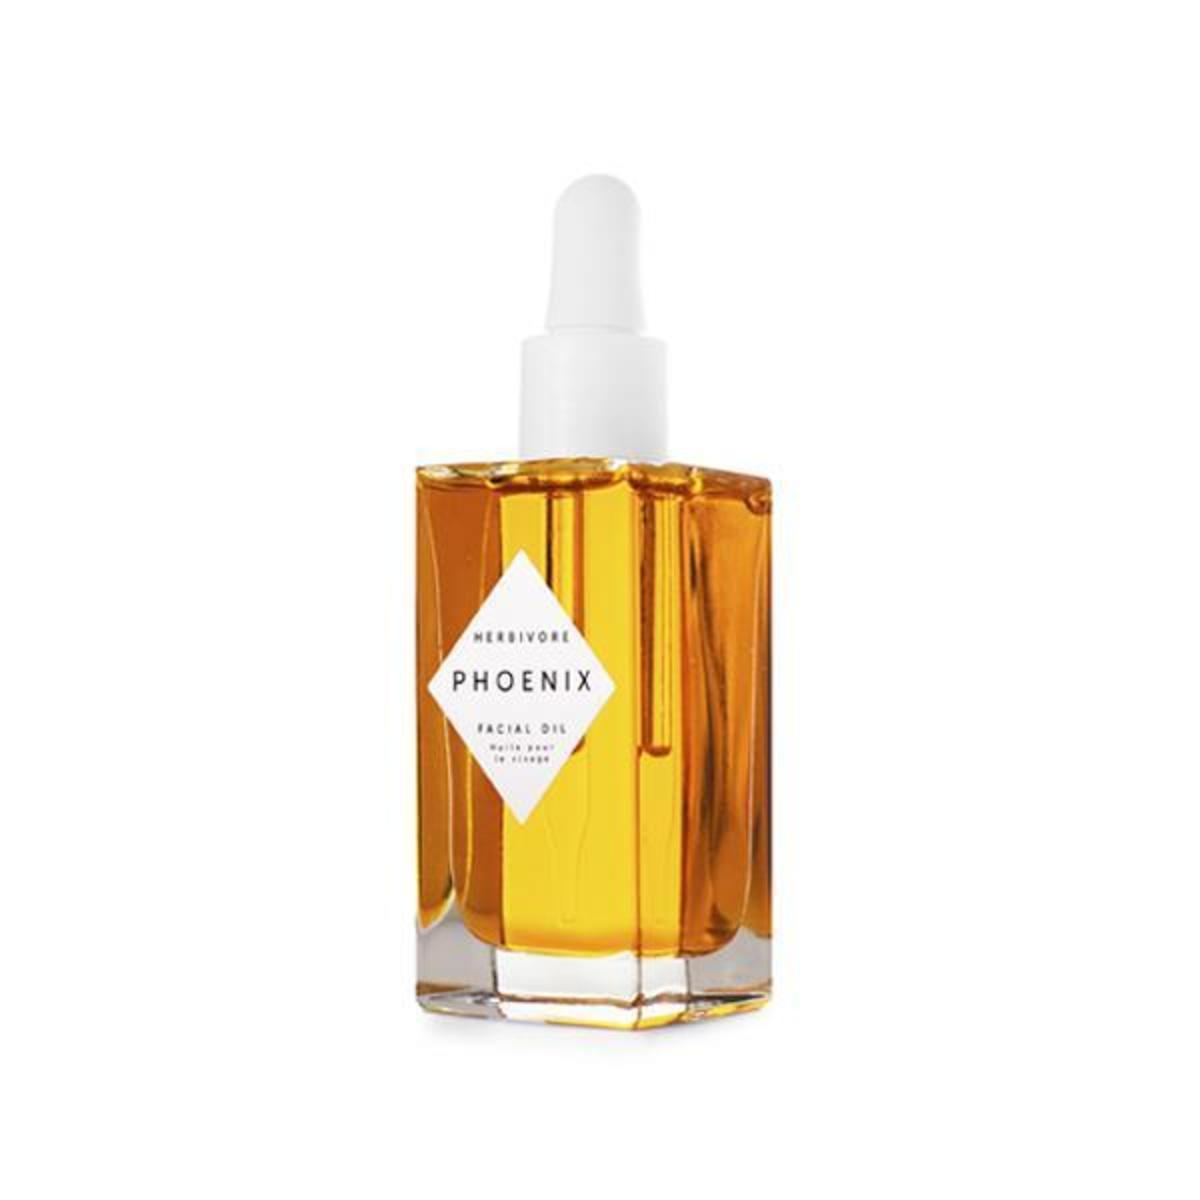 Herbivore Phoenix Facial Oil